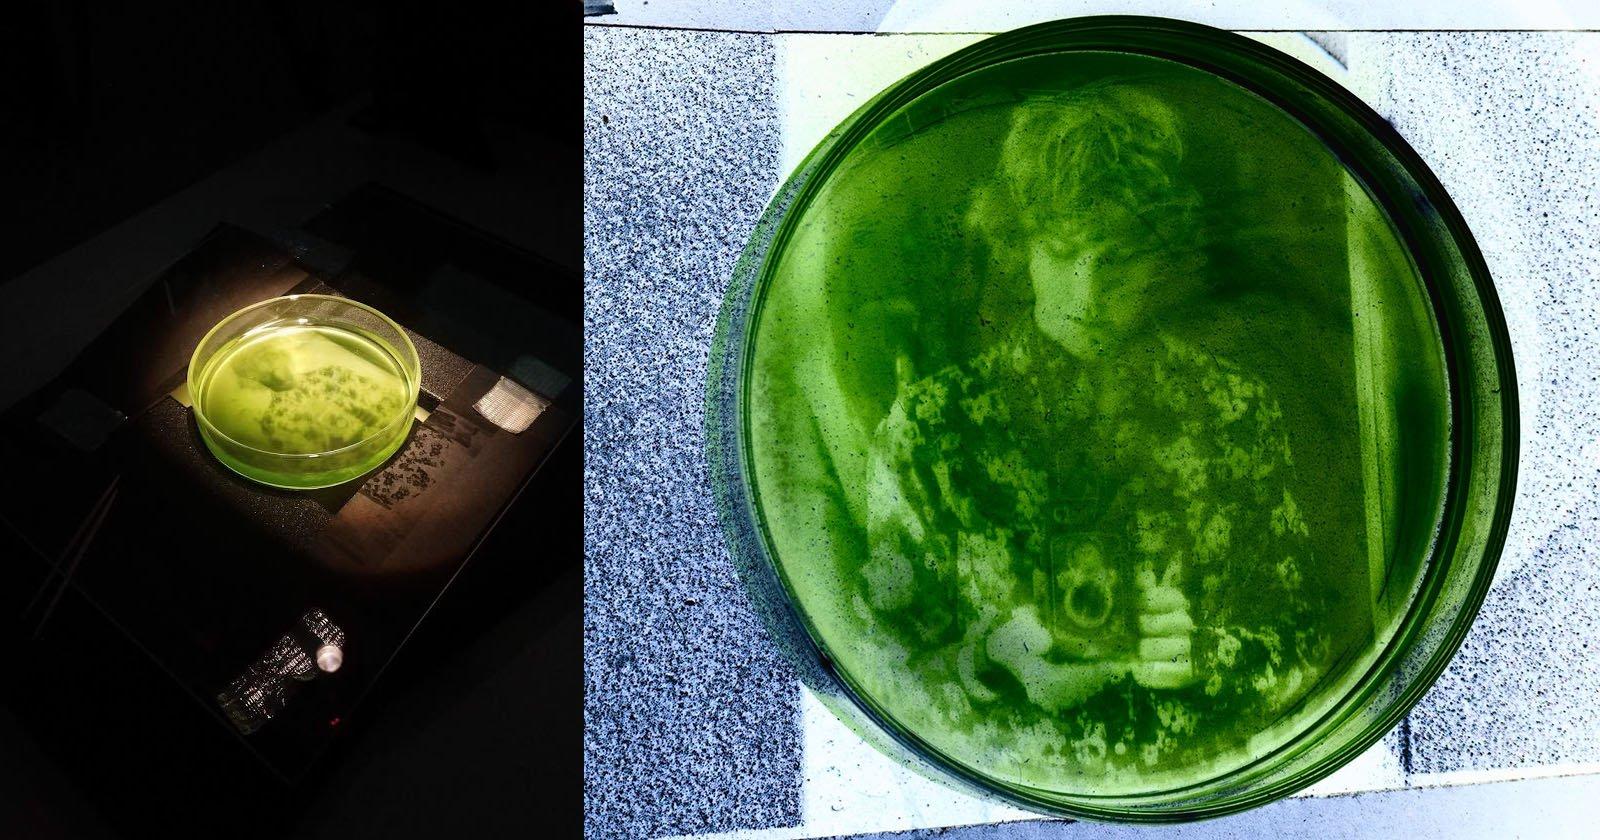 This Photographer is Printing Photos on Algae